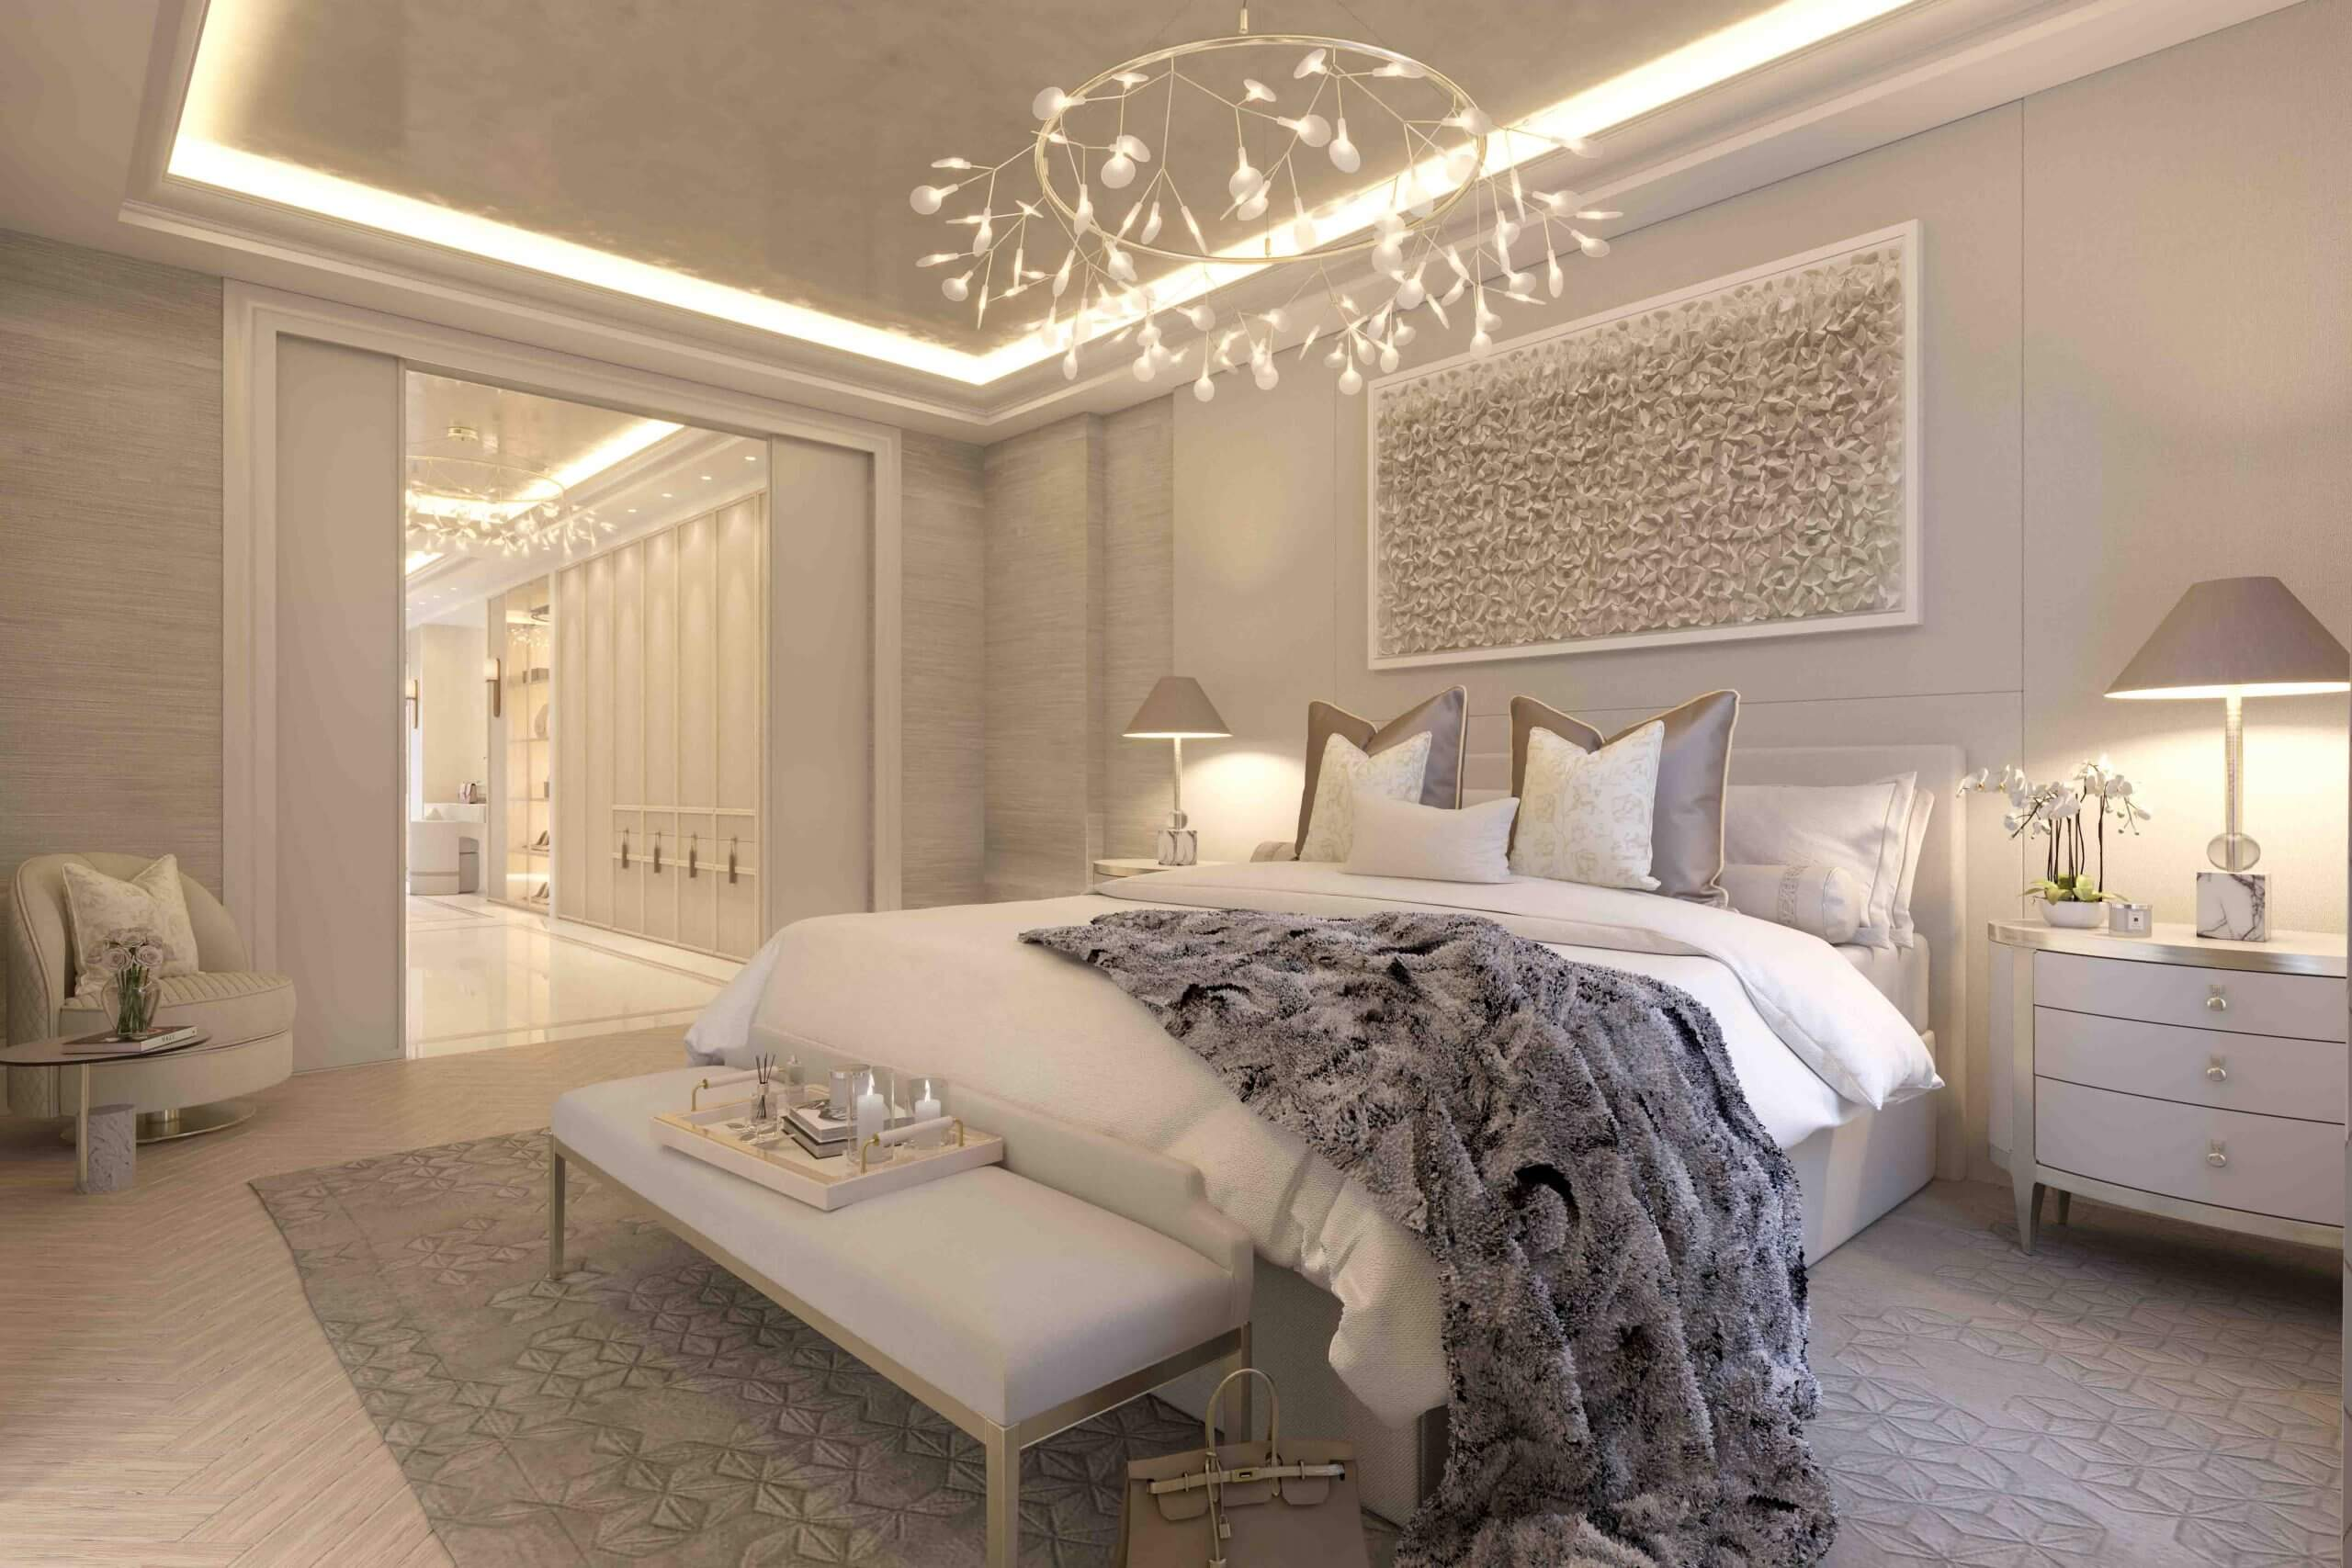 London House bedroom